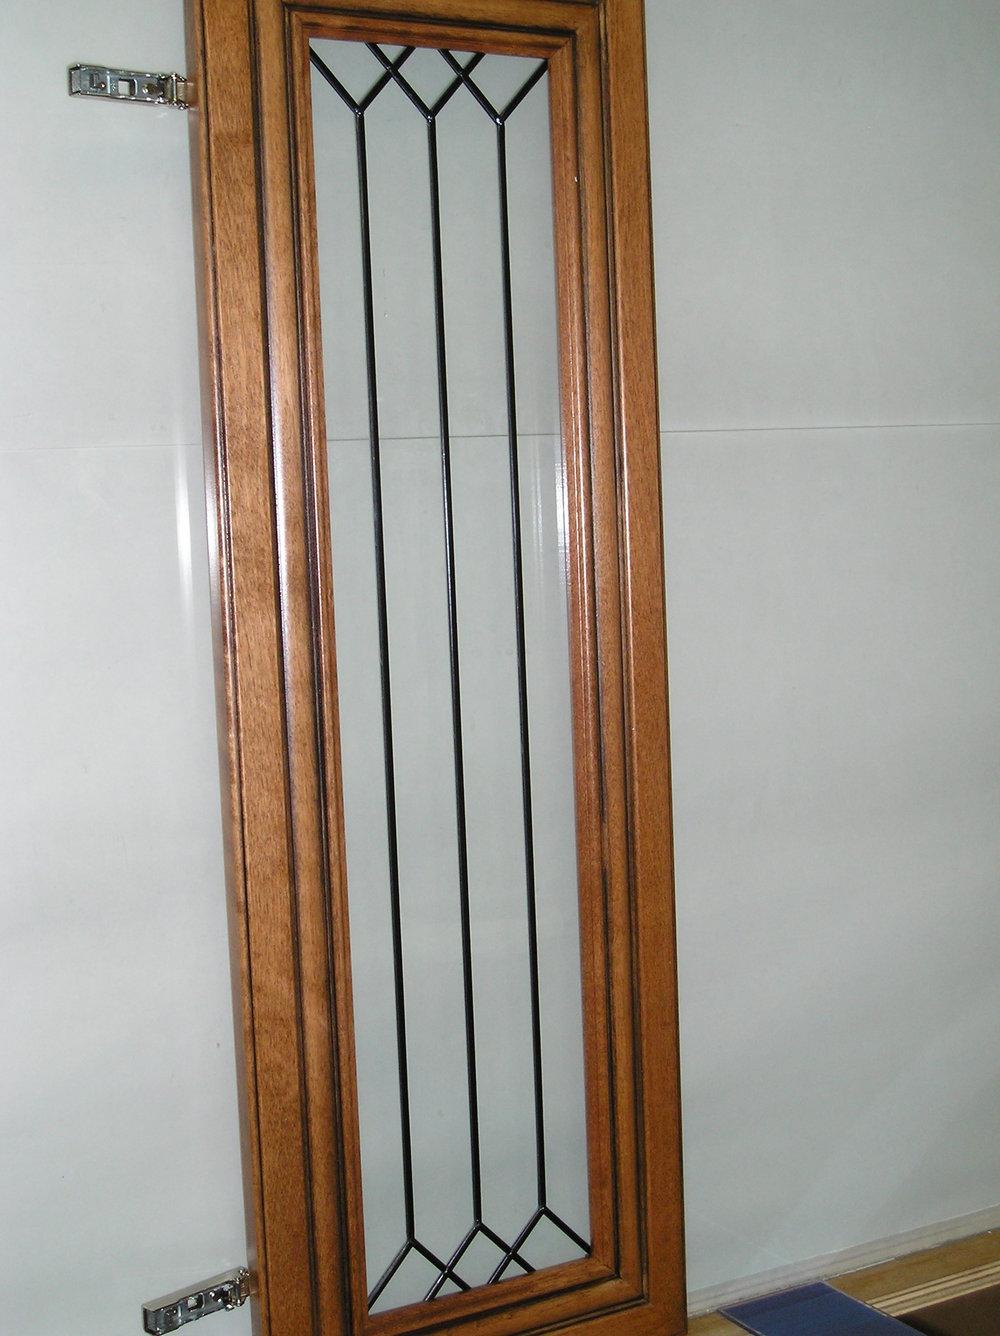 cabinets (1).JPG